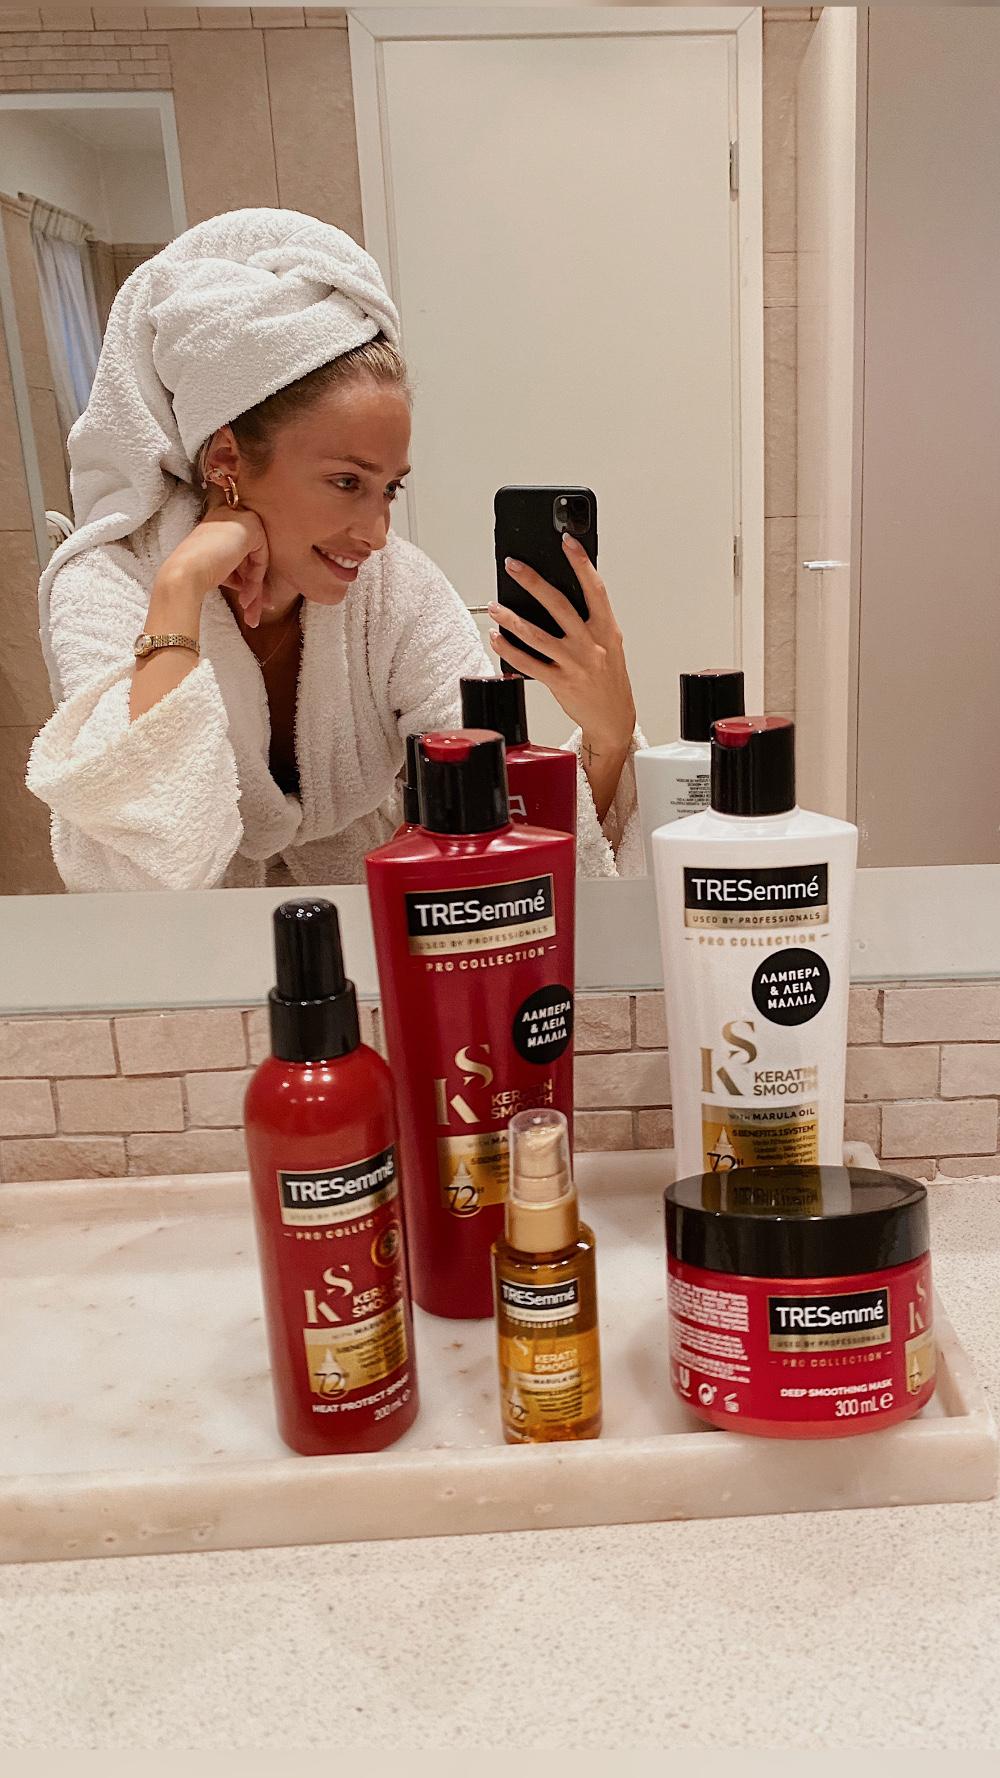 tresemme evaggelinou keratin hair challenge 3